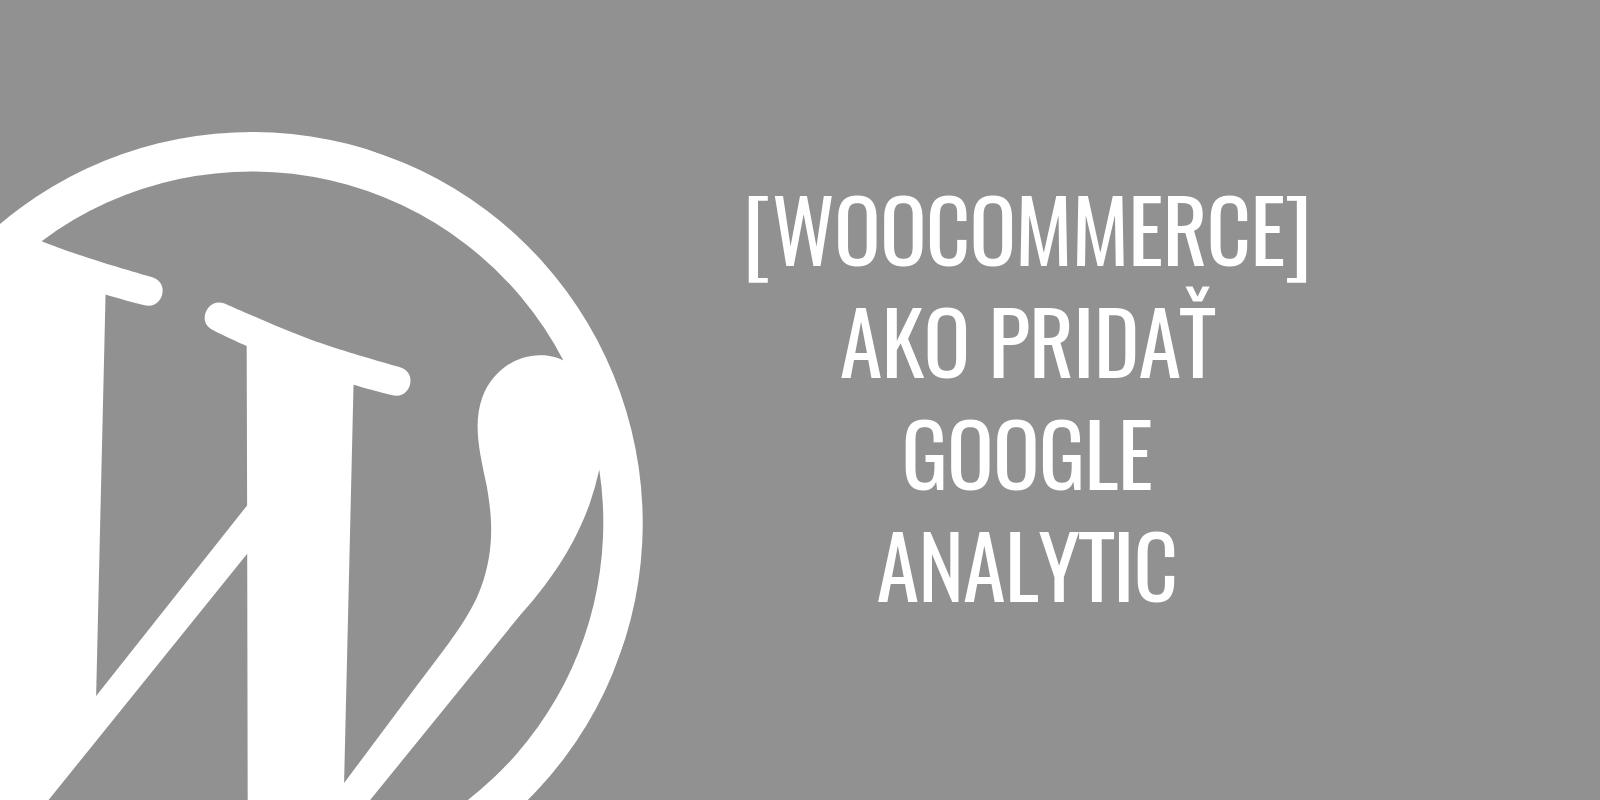 Ako pridaťGoogle Analytics vo WooCommerce